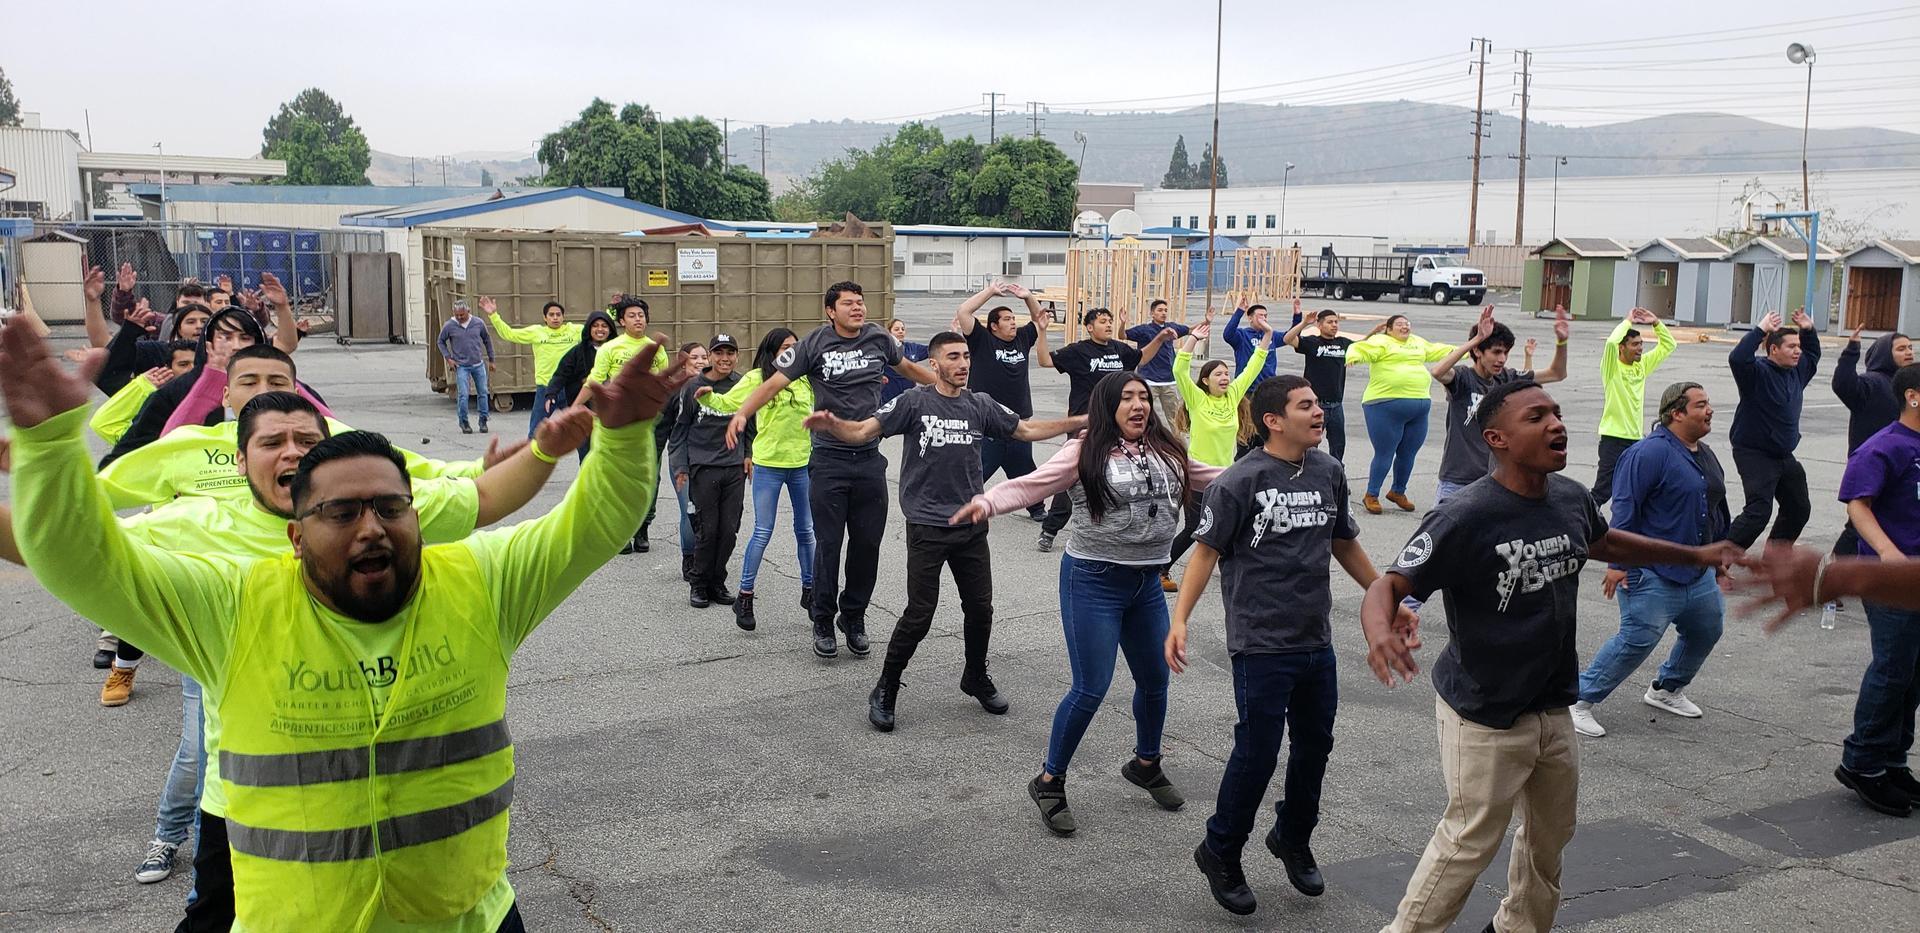 LA CAUSA students do jumping jacks